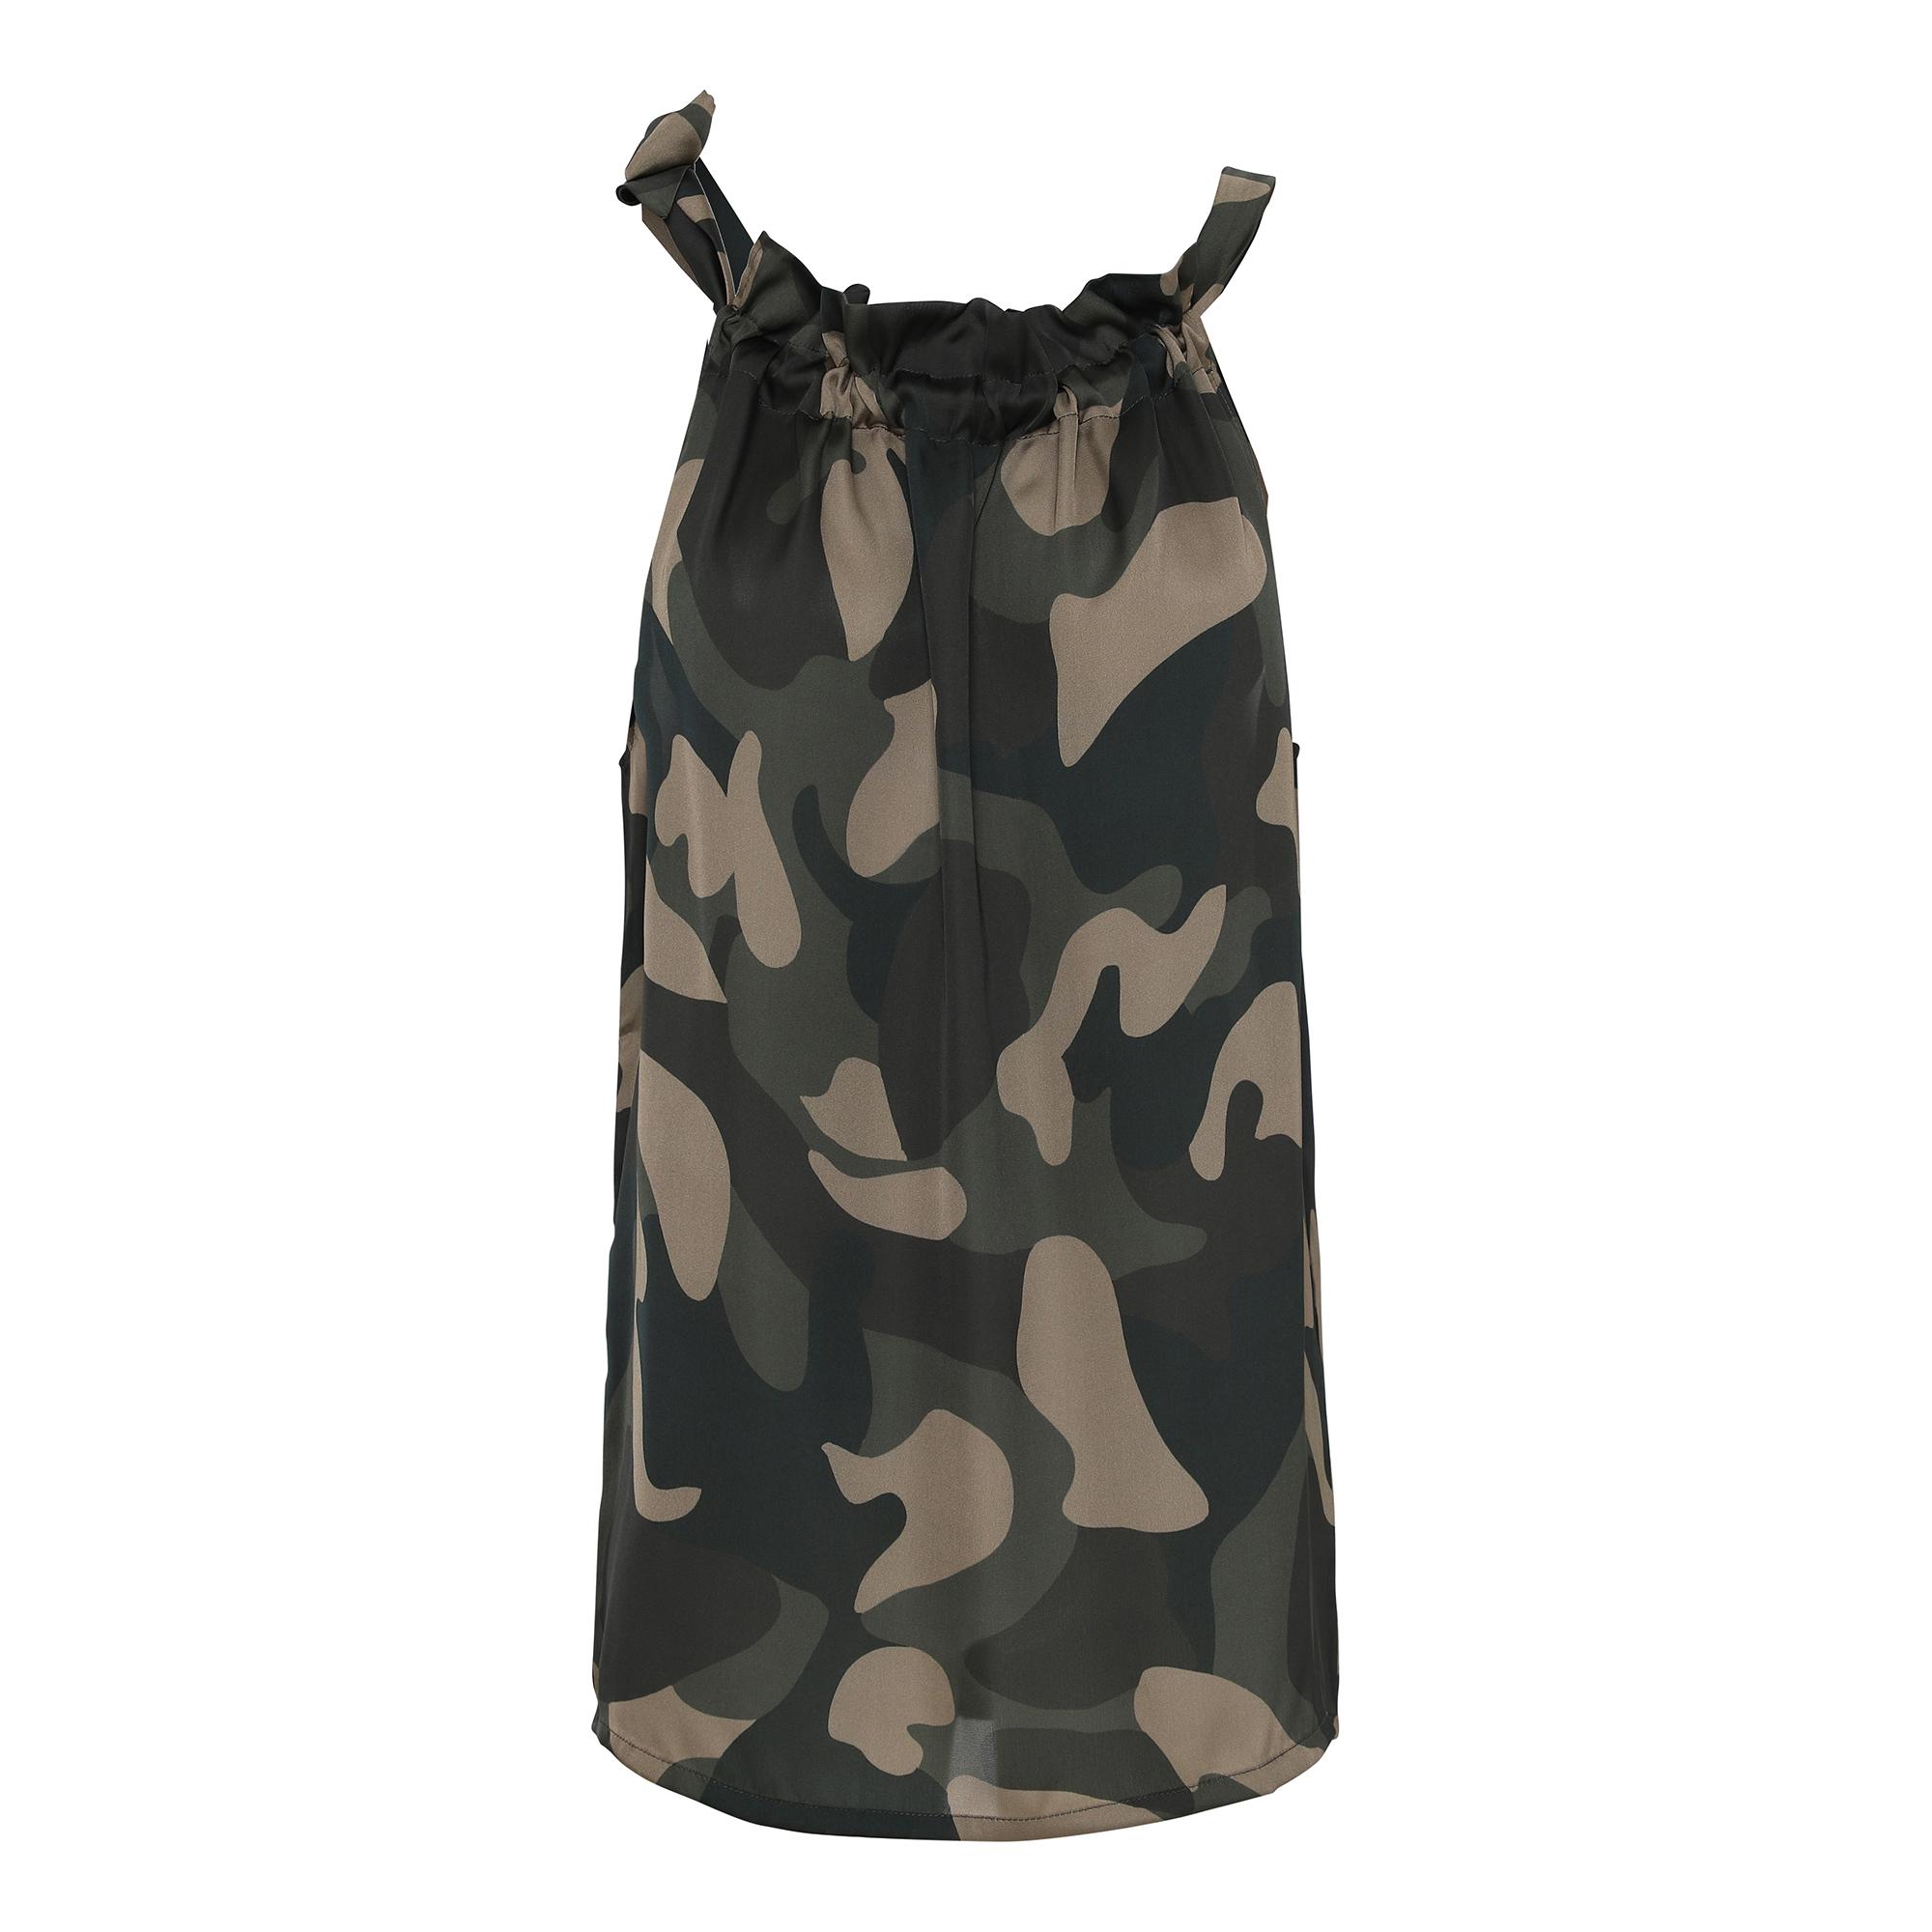 Linne, Karmamia, Camouflage Ruffle Tie Top